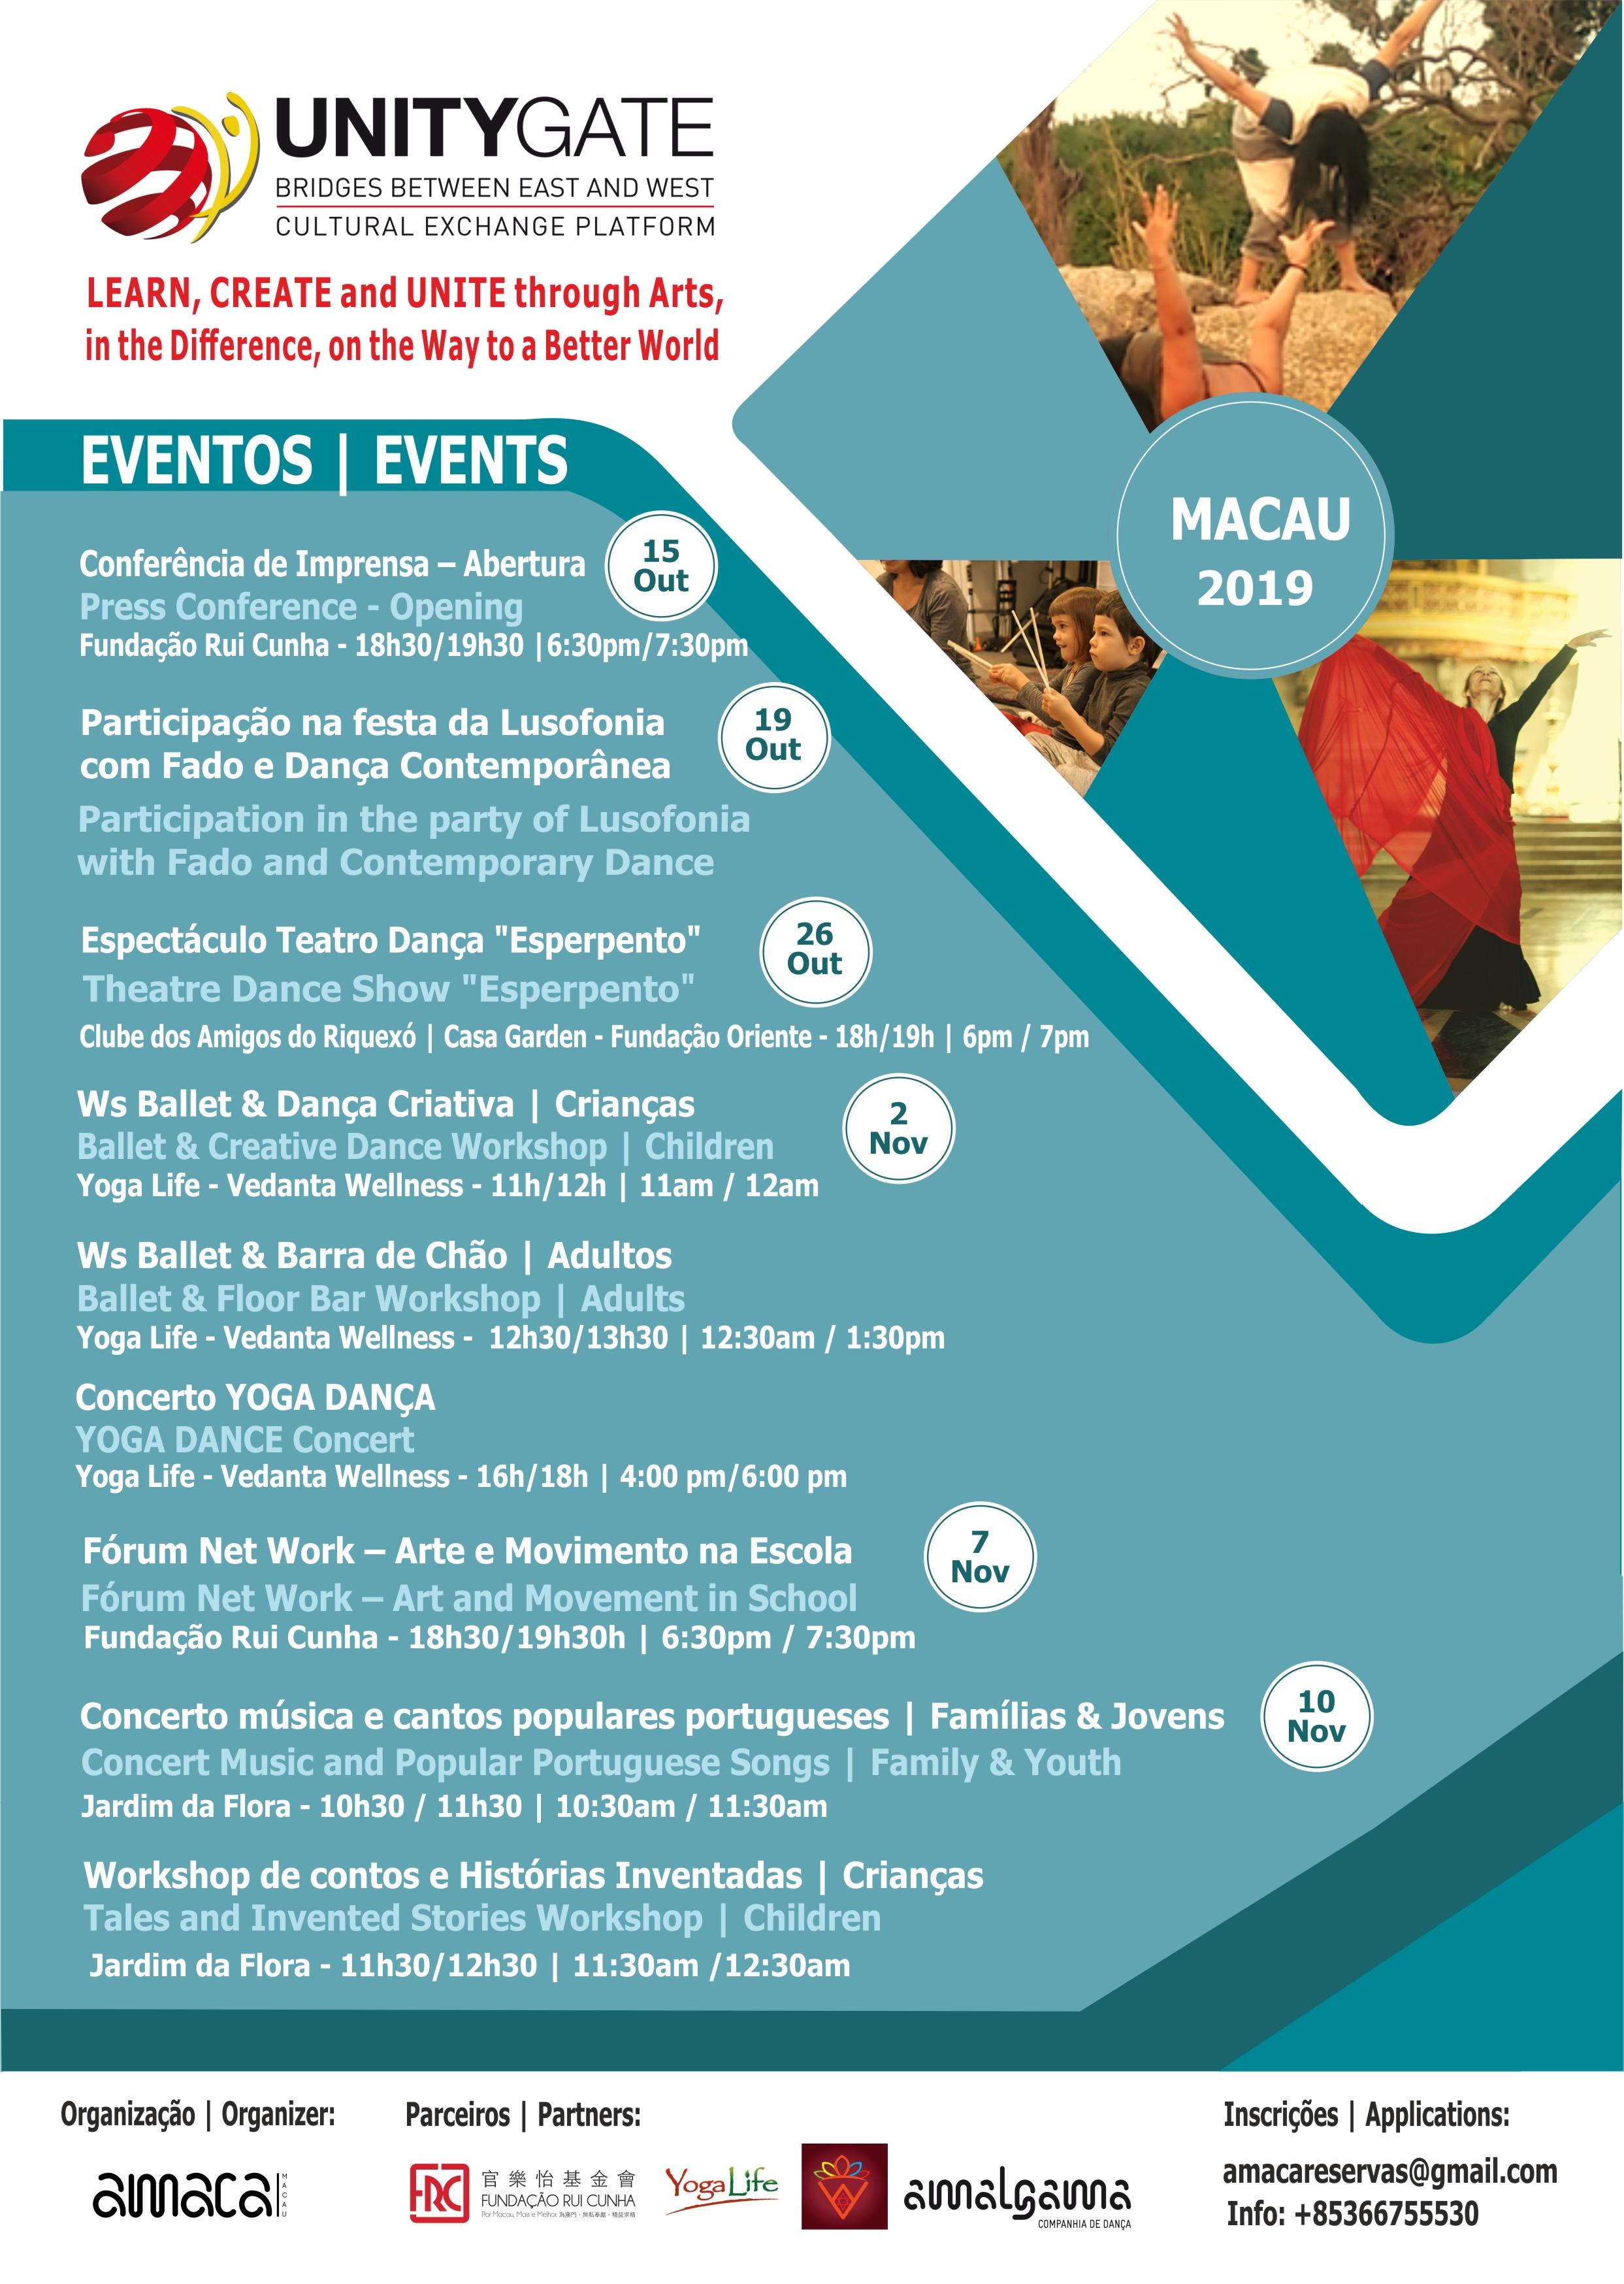 programa unitygte 2019 - Macau.jpg